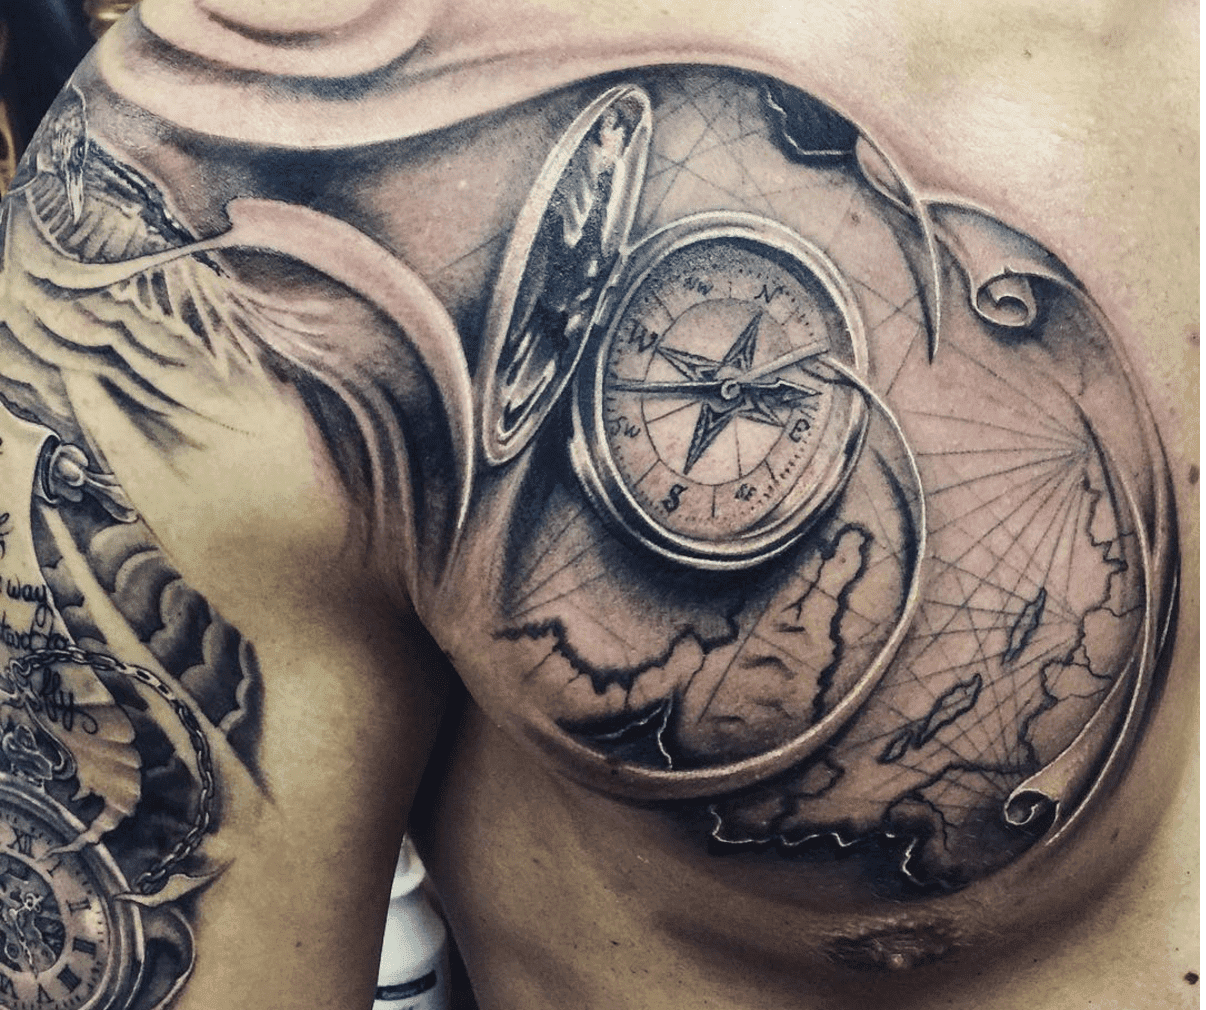 Tatuaje Brujula Hombre Pecho Sfb